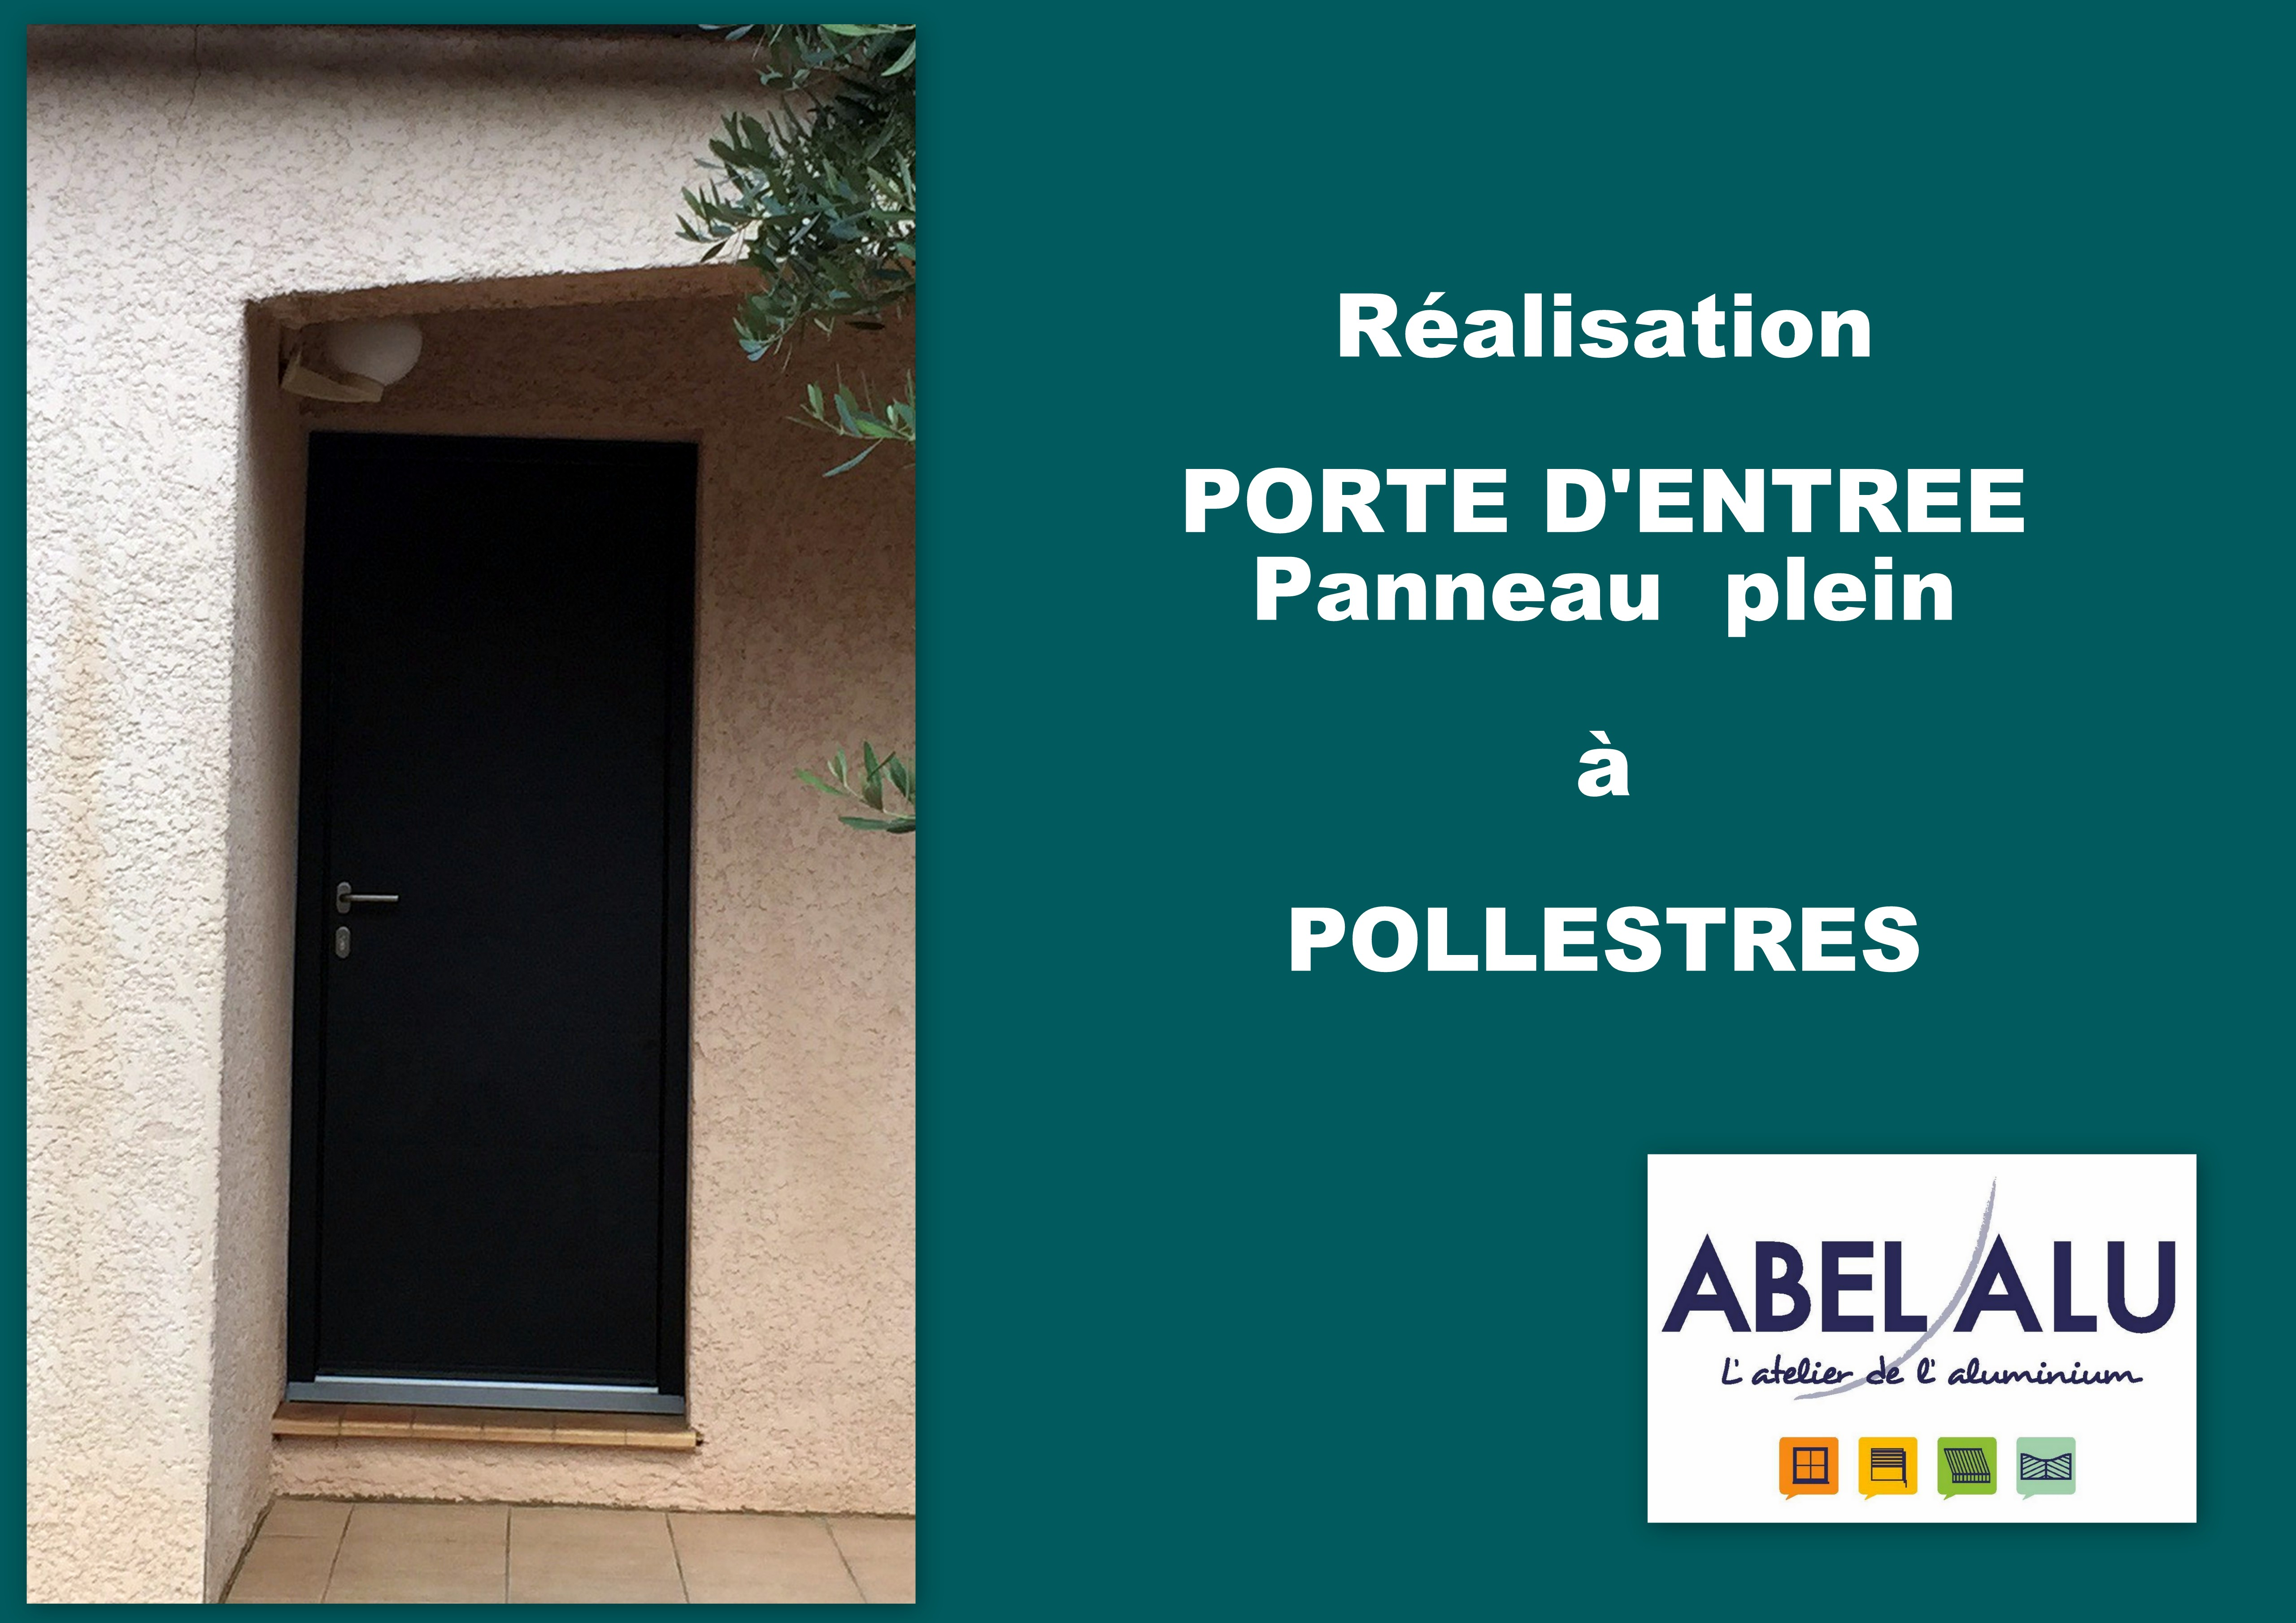 ABEL ALU - PORTE D'ENTREE - POLLESTRES